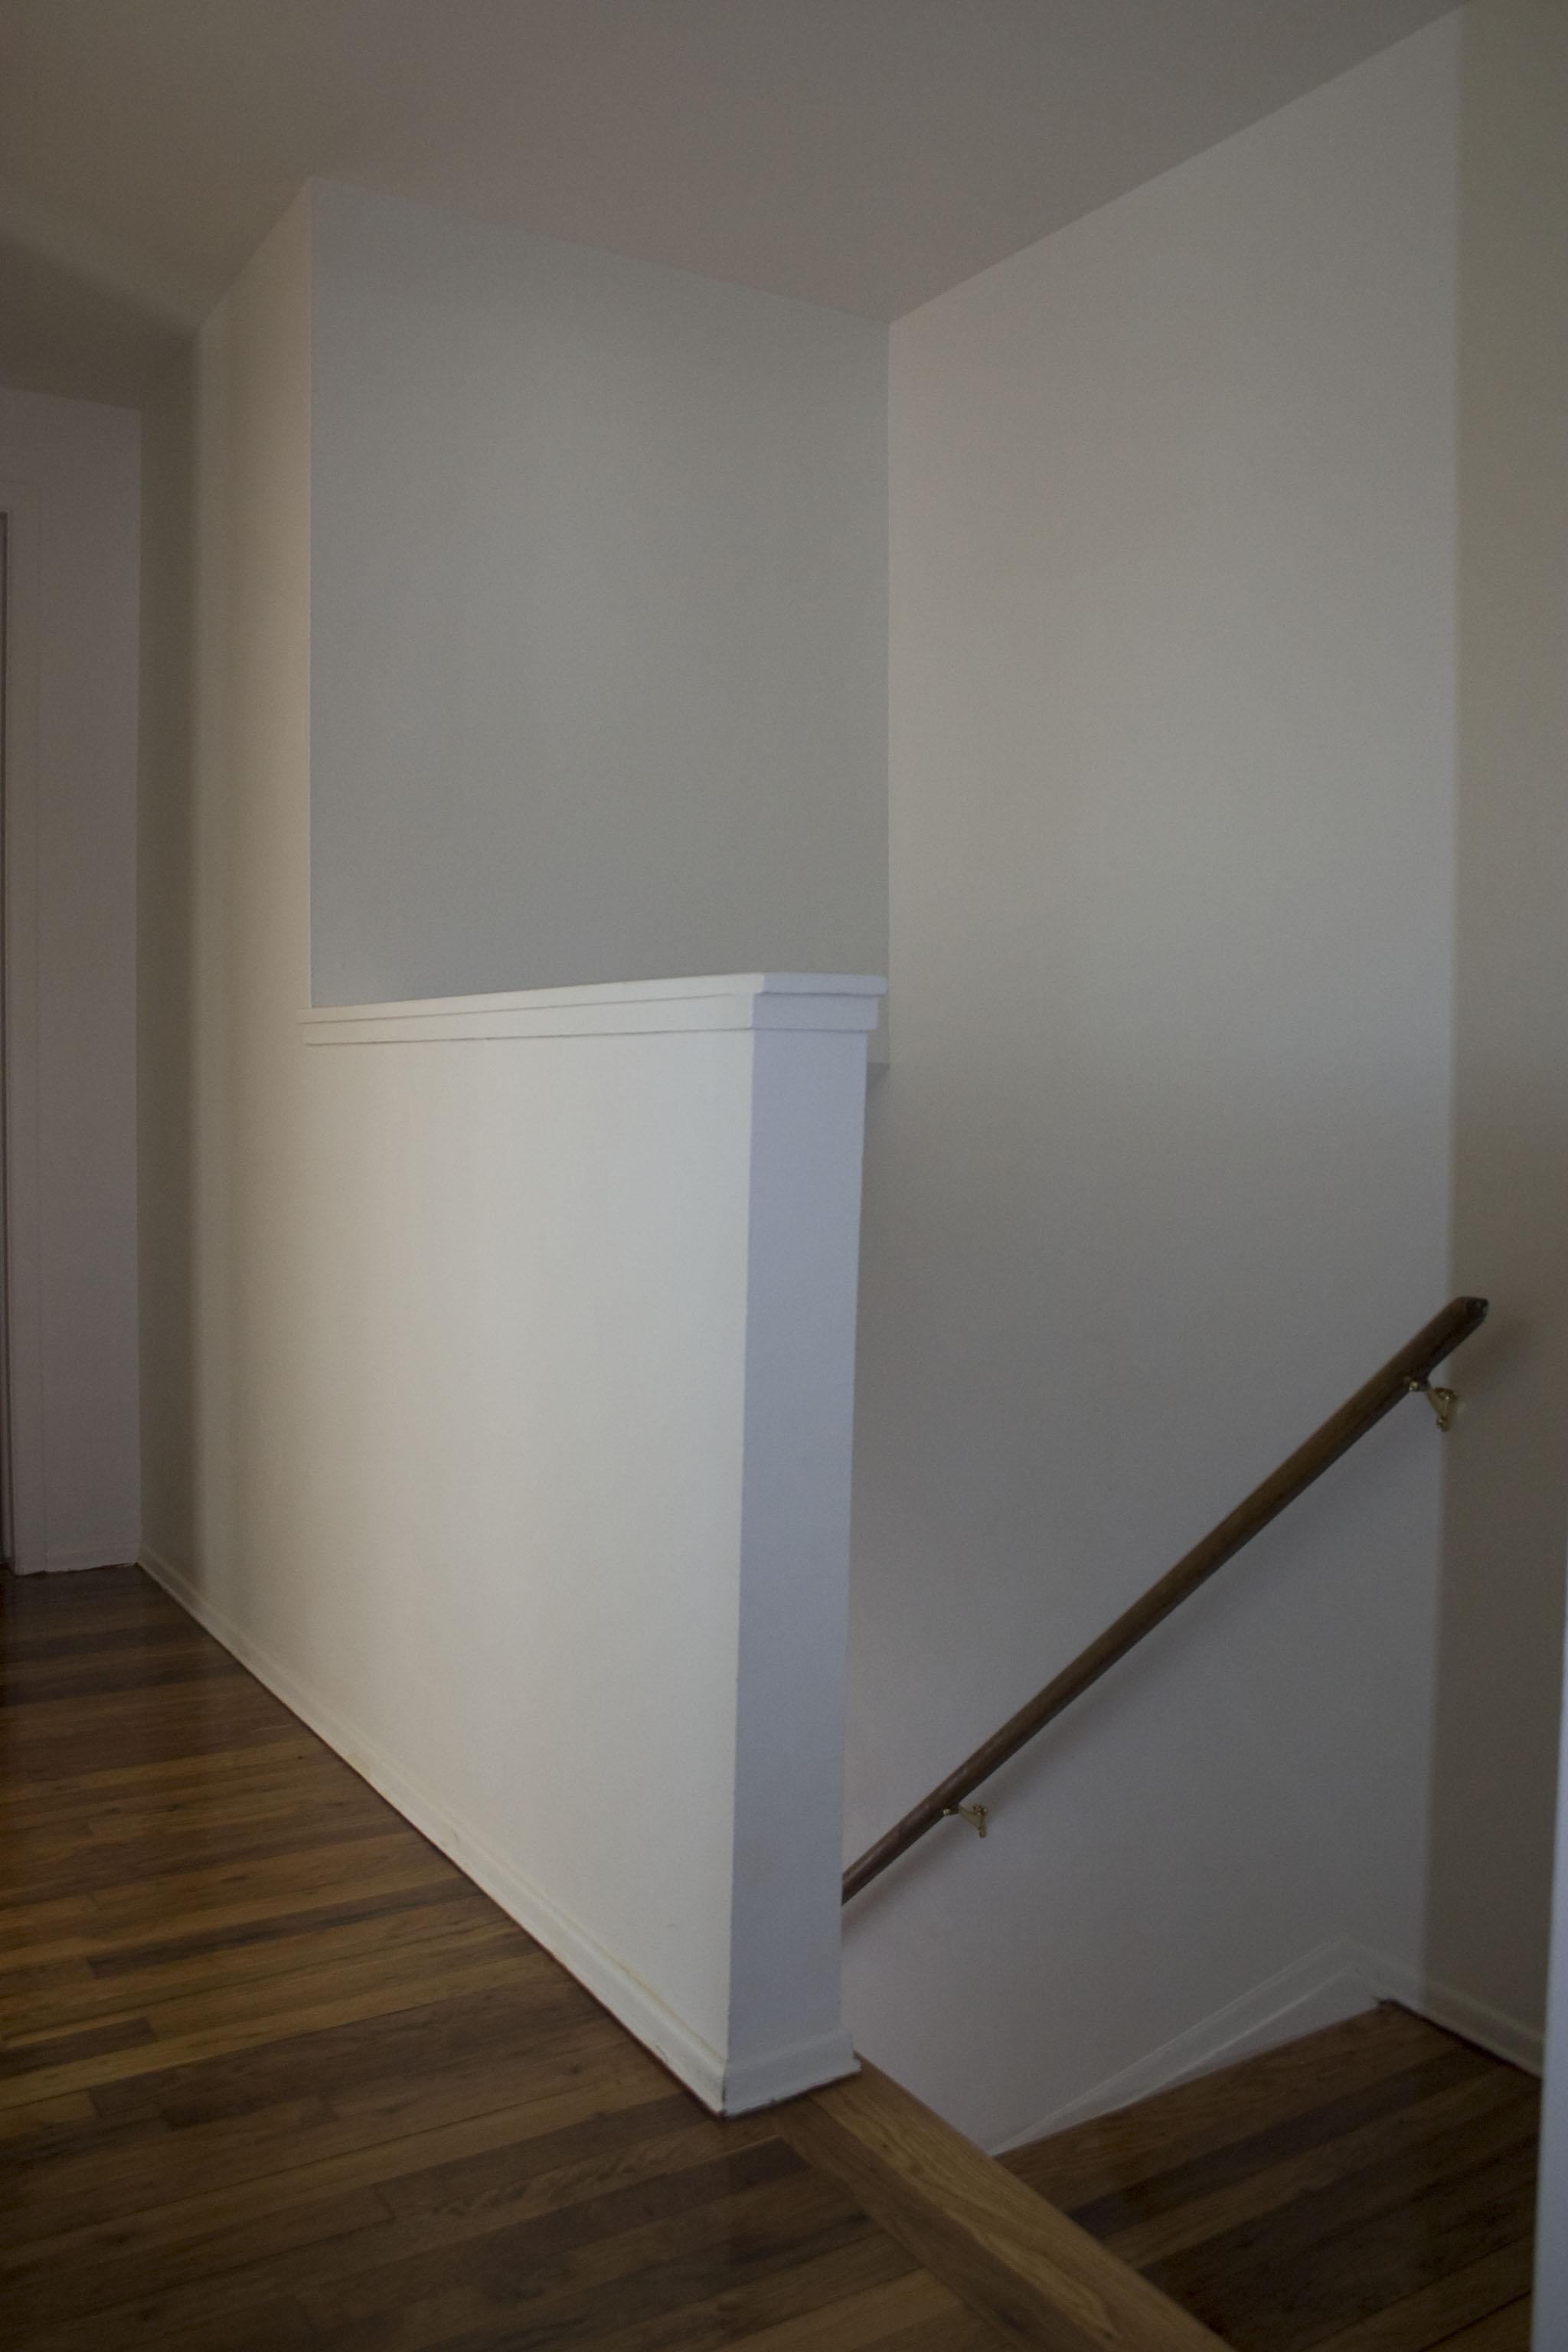 2-bedroom upstairs hallway